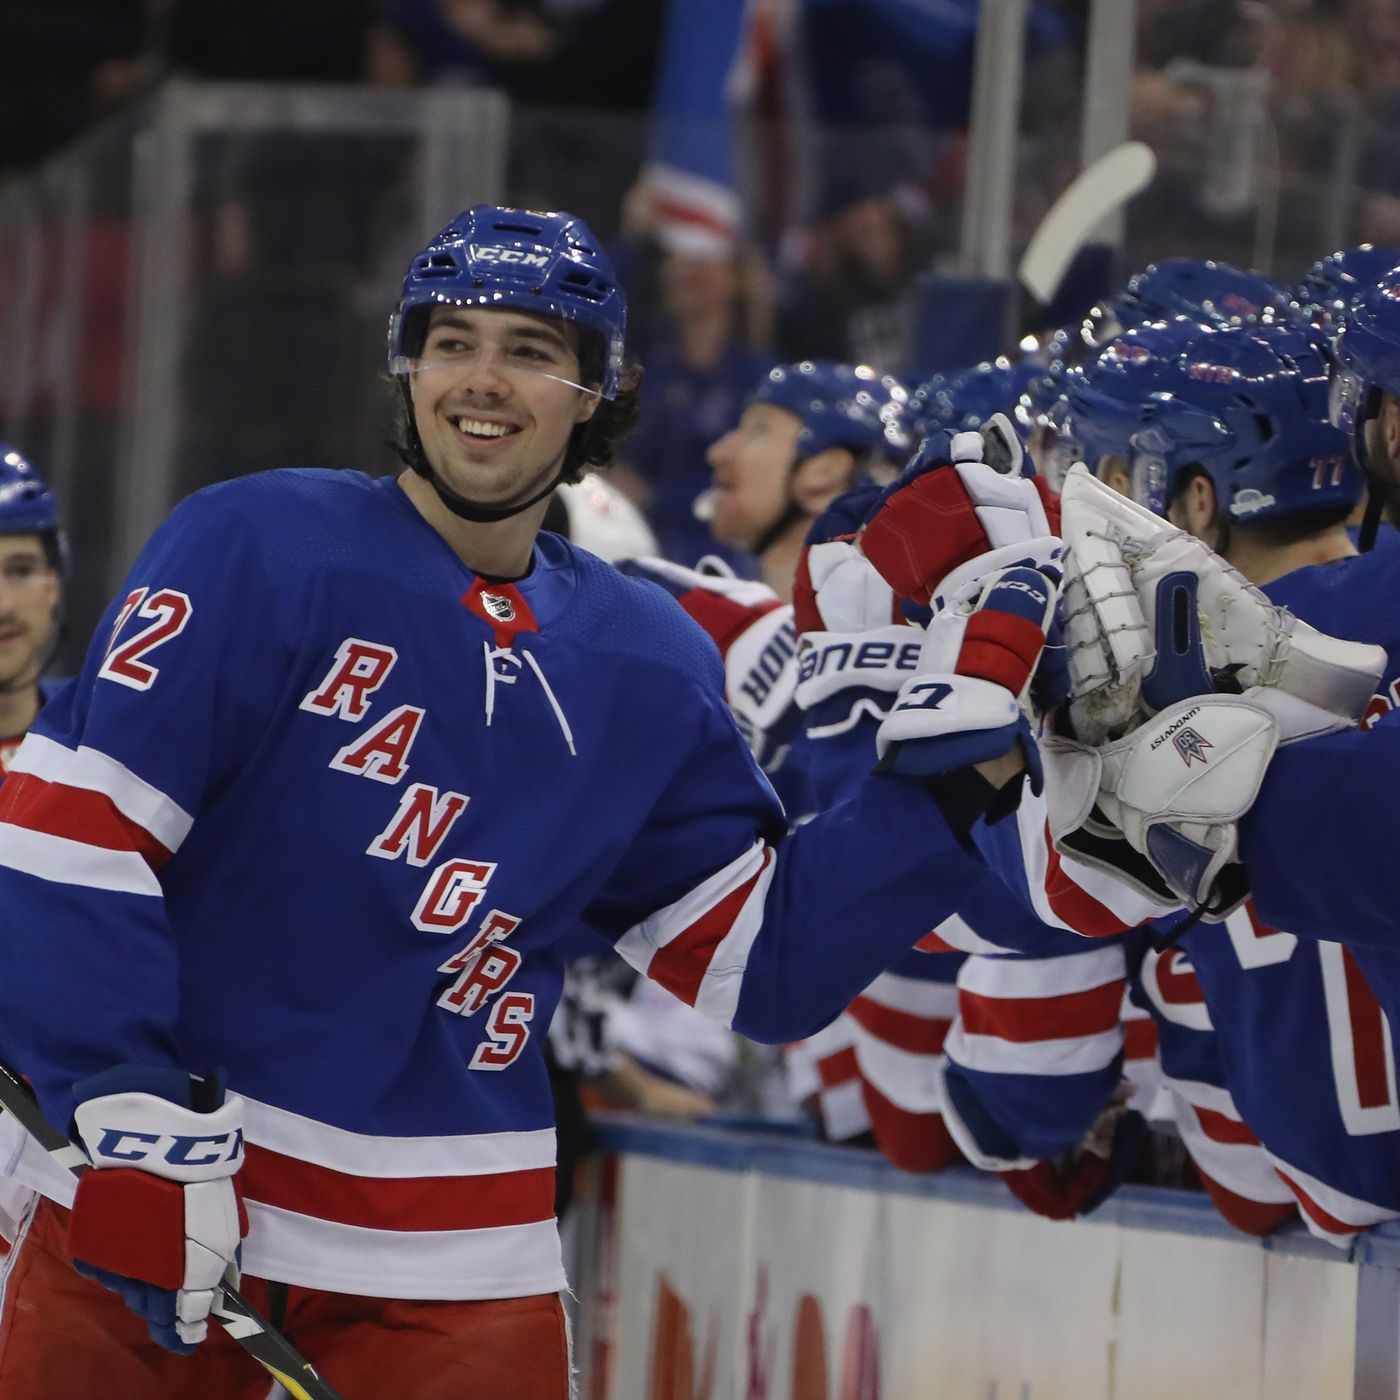 Rangers vs. Islanders  Chytil Extends Goal Streak to Five Games ... 22b52ca0d484